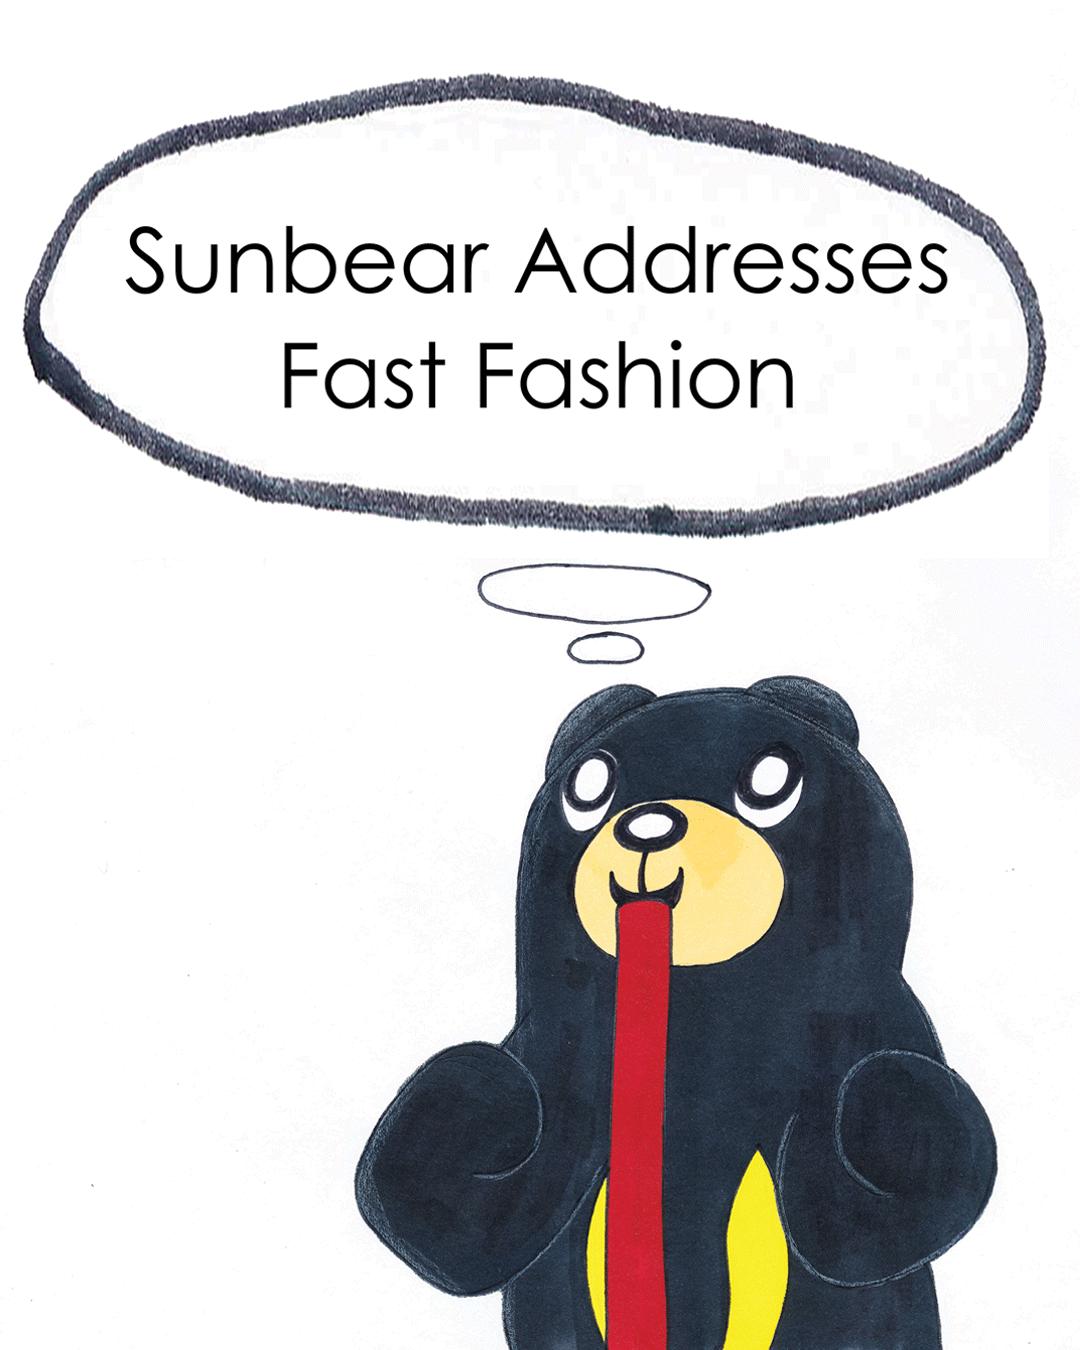 Instagram-template-version-2-2-9-2019_0003_Sunbear-Addresses-Fast-Fashion.png